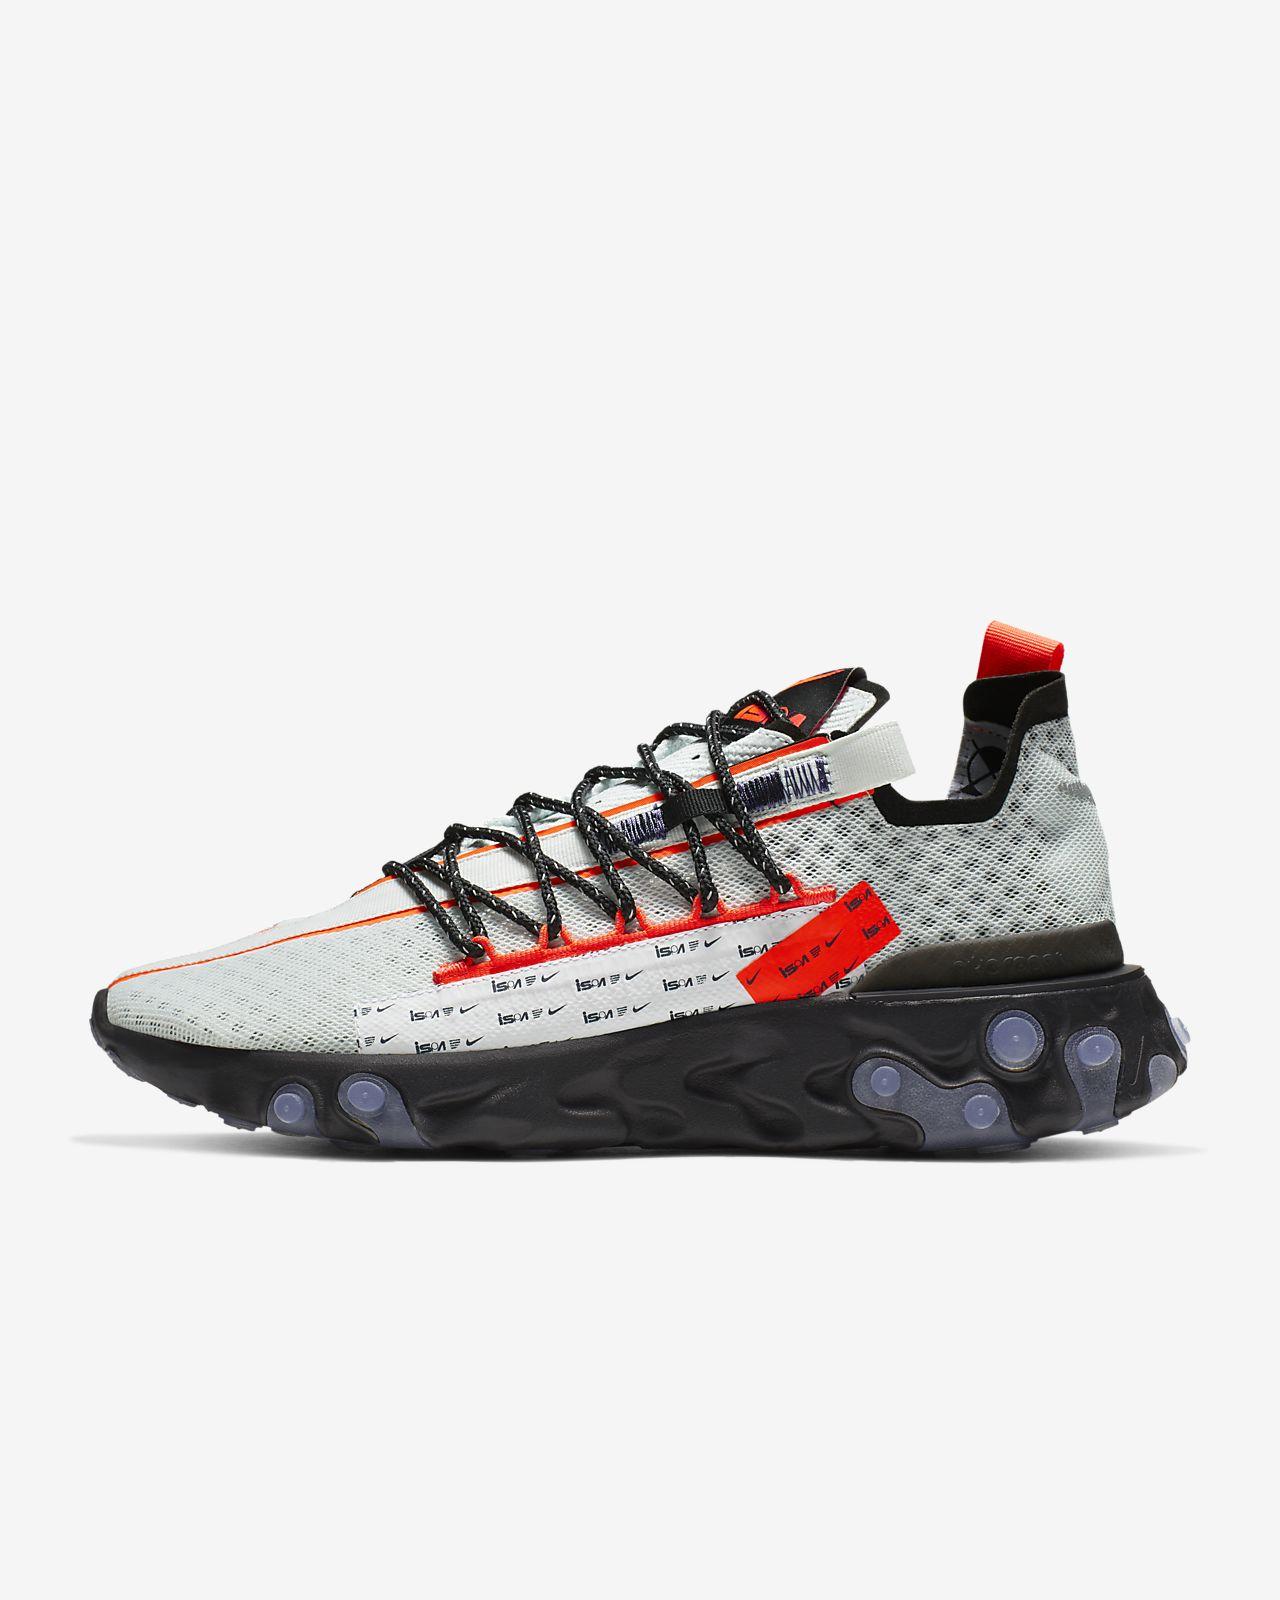 Nike ISPA React Men\u2019s Shoe